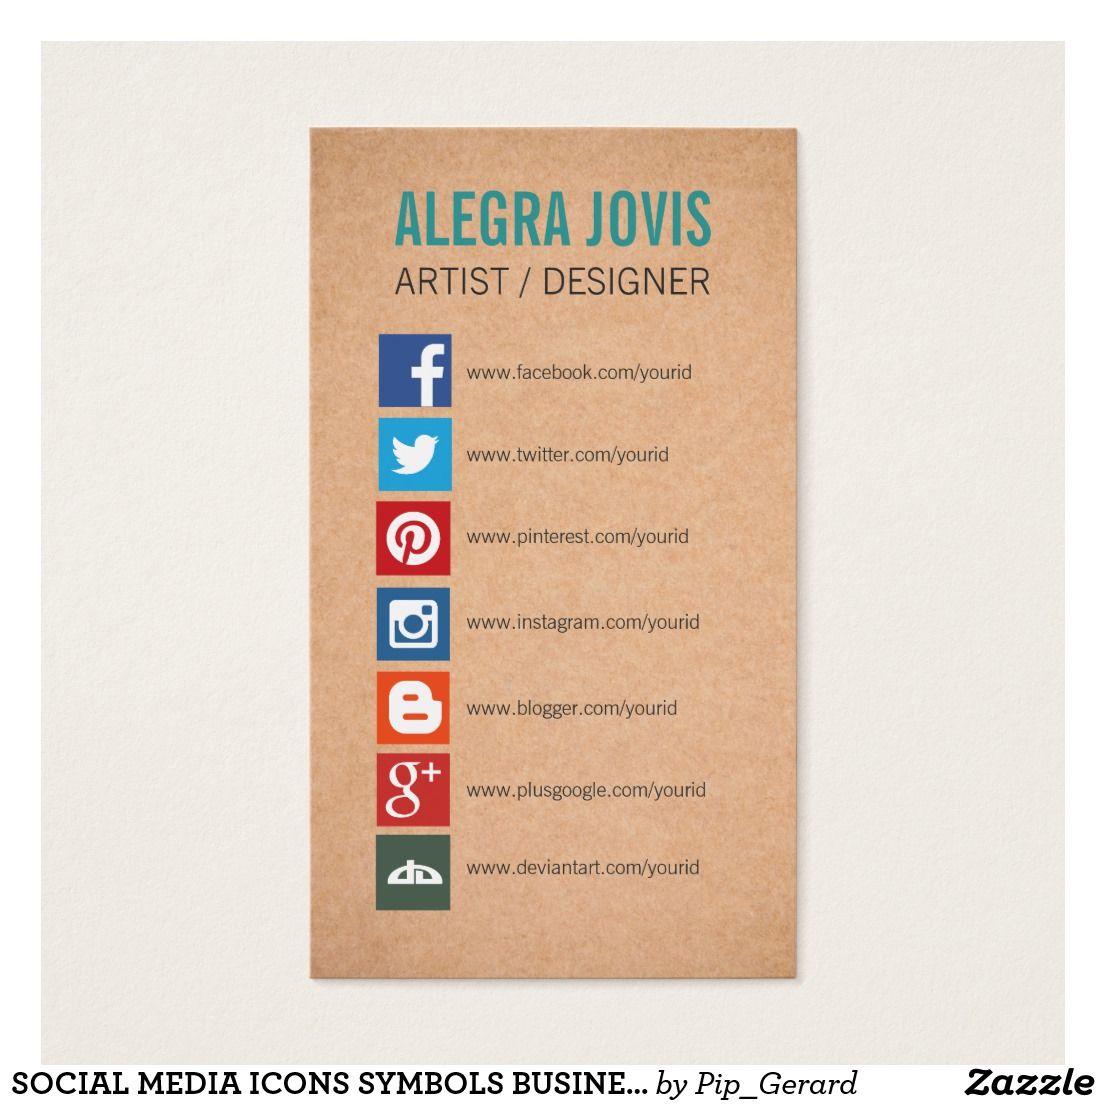 social media icons symbols business card  social media icons